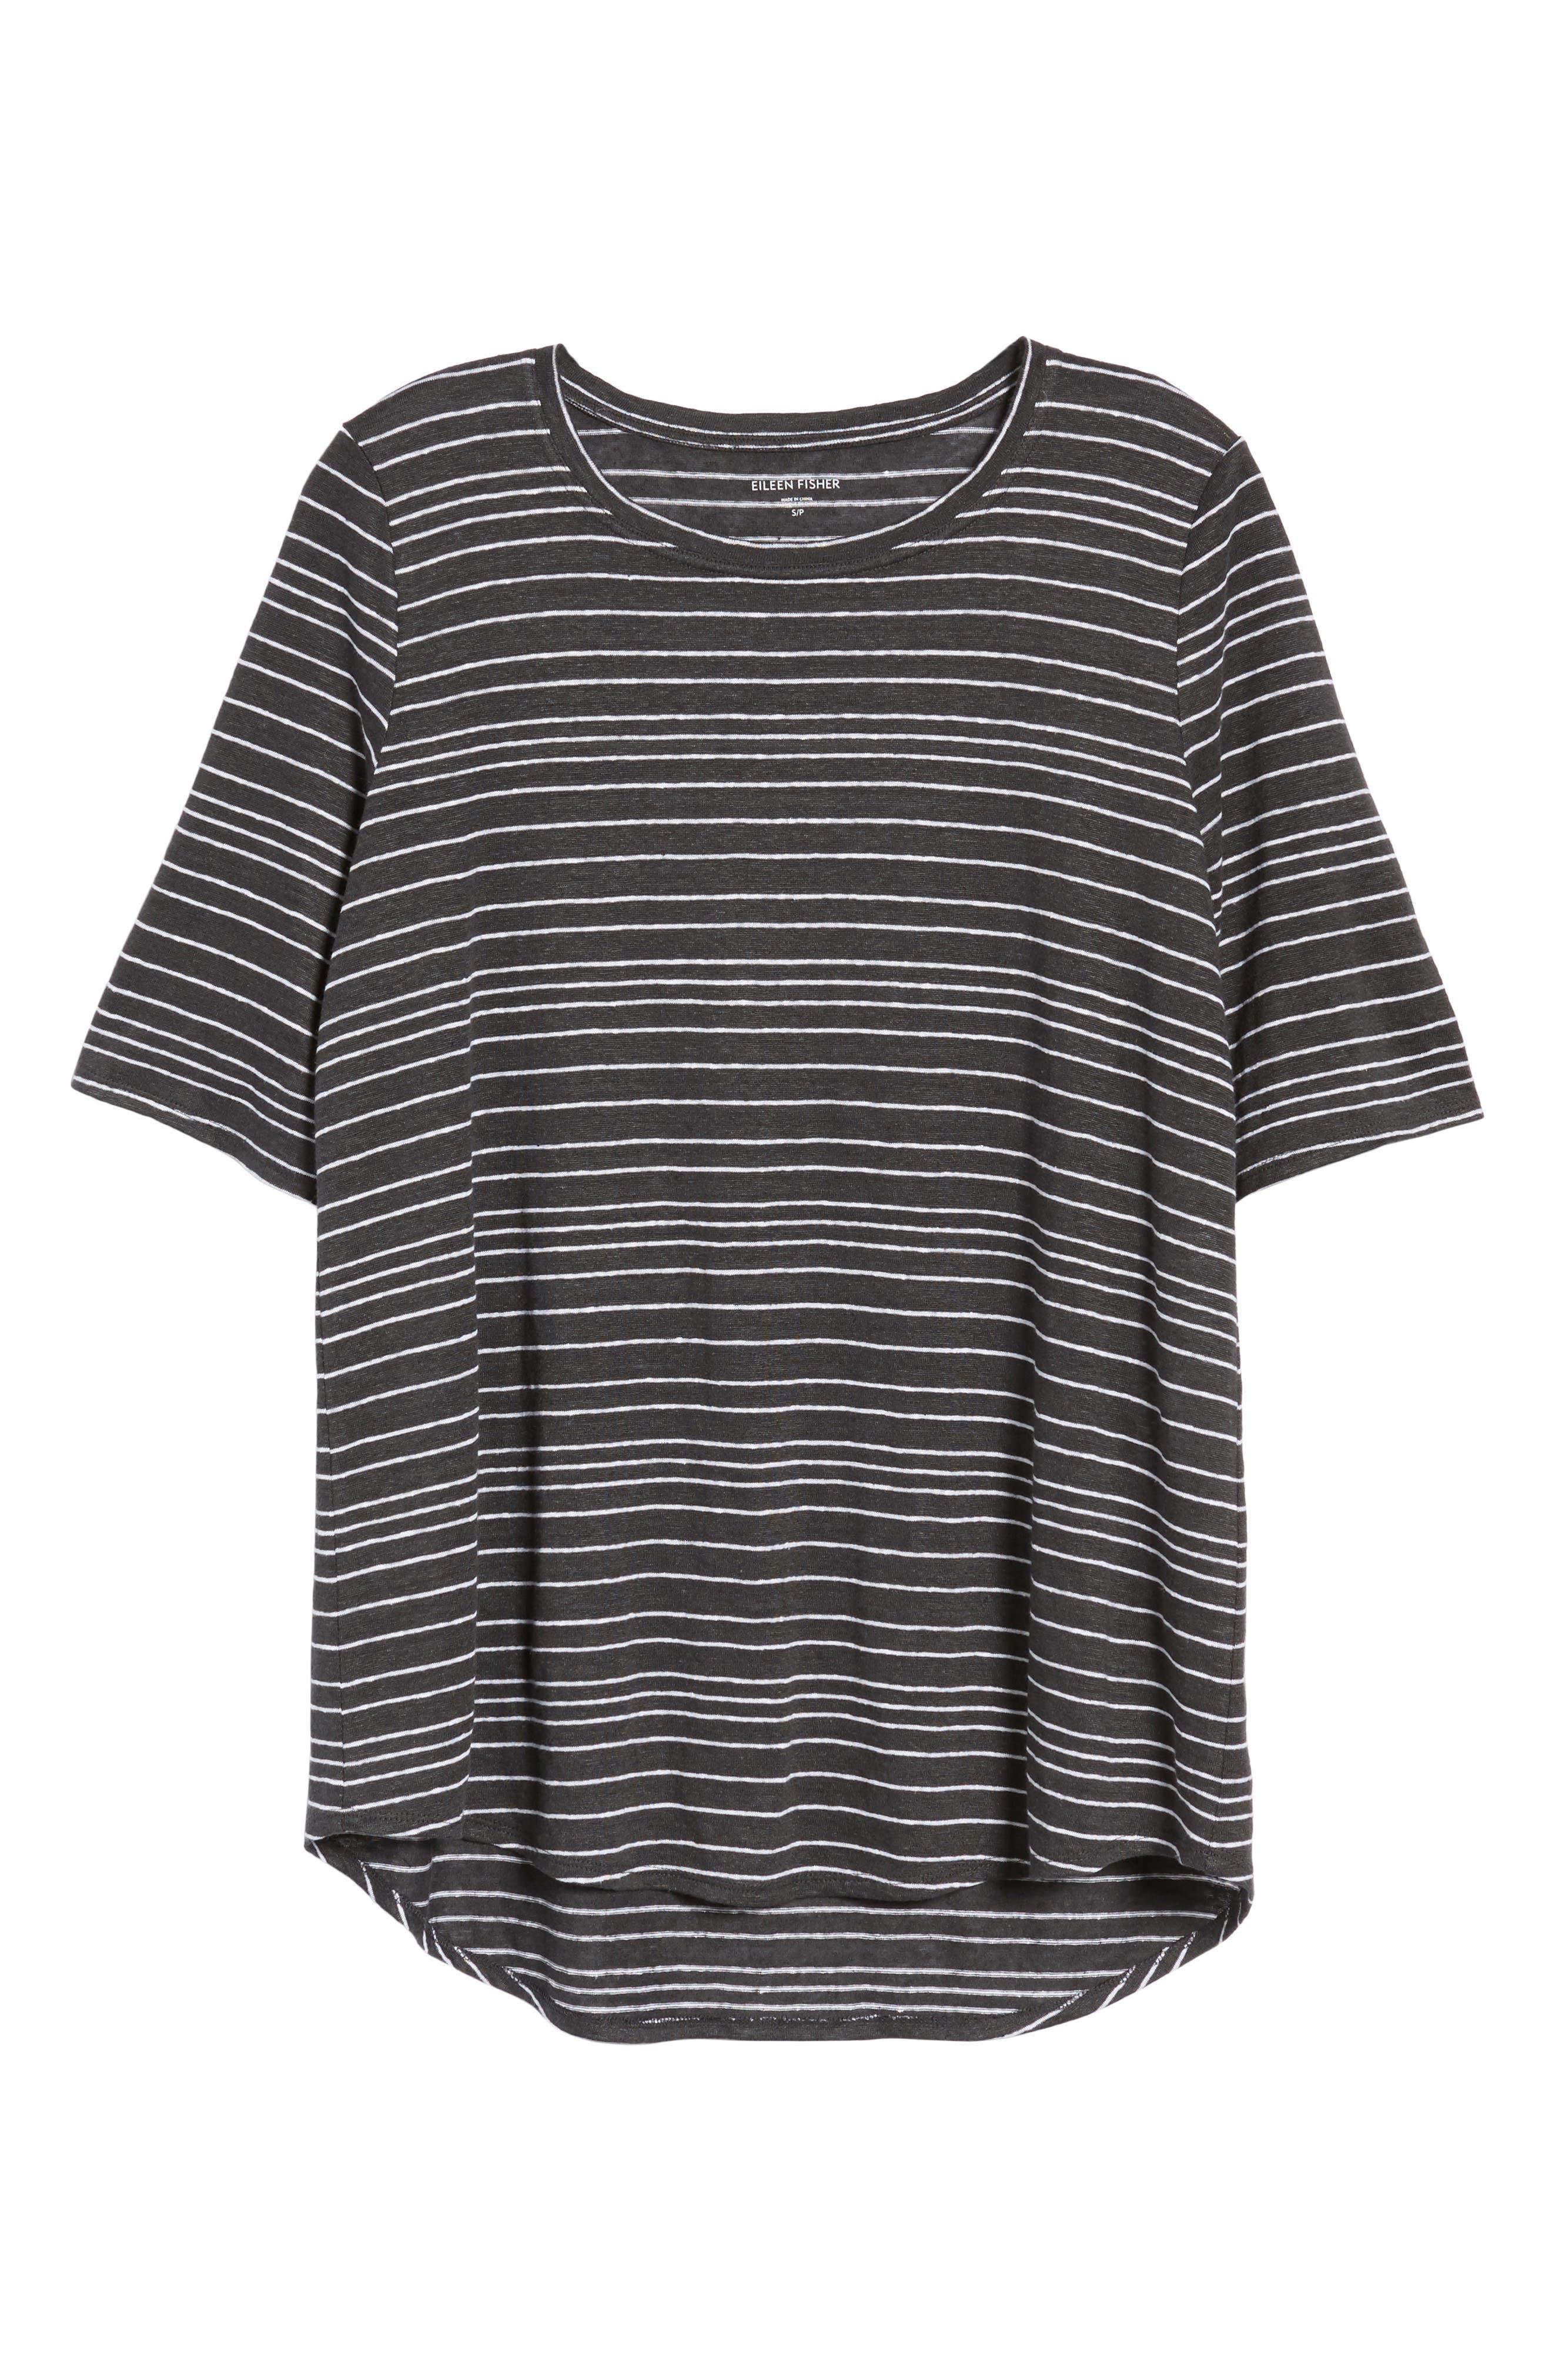 Stripe Organic Linen Top,                             Alternate thumbnail 7, color,                             025